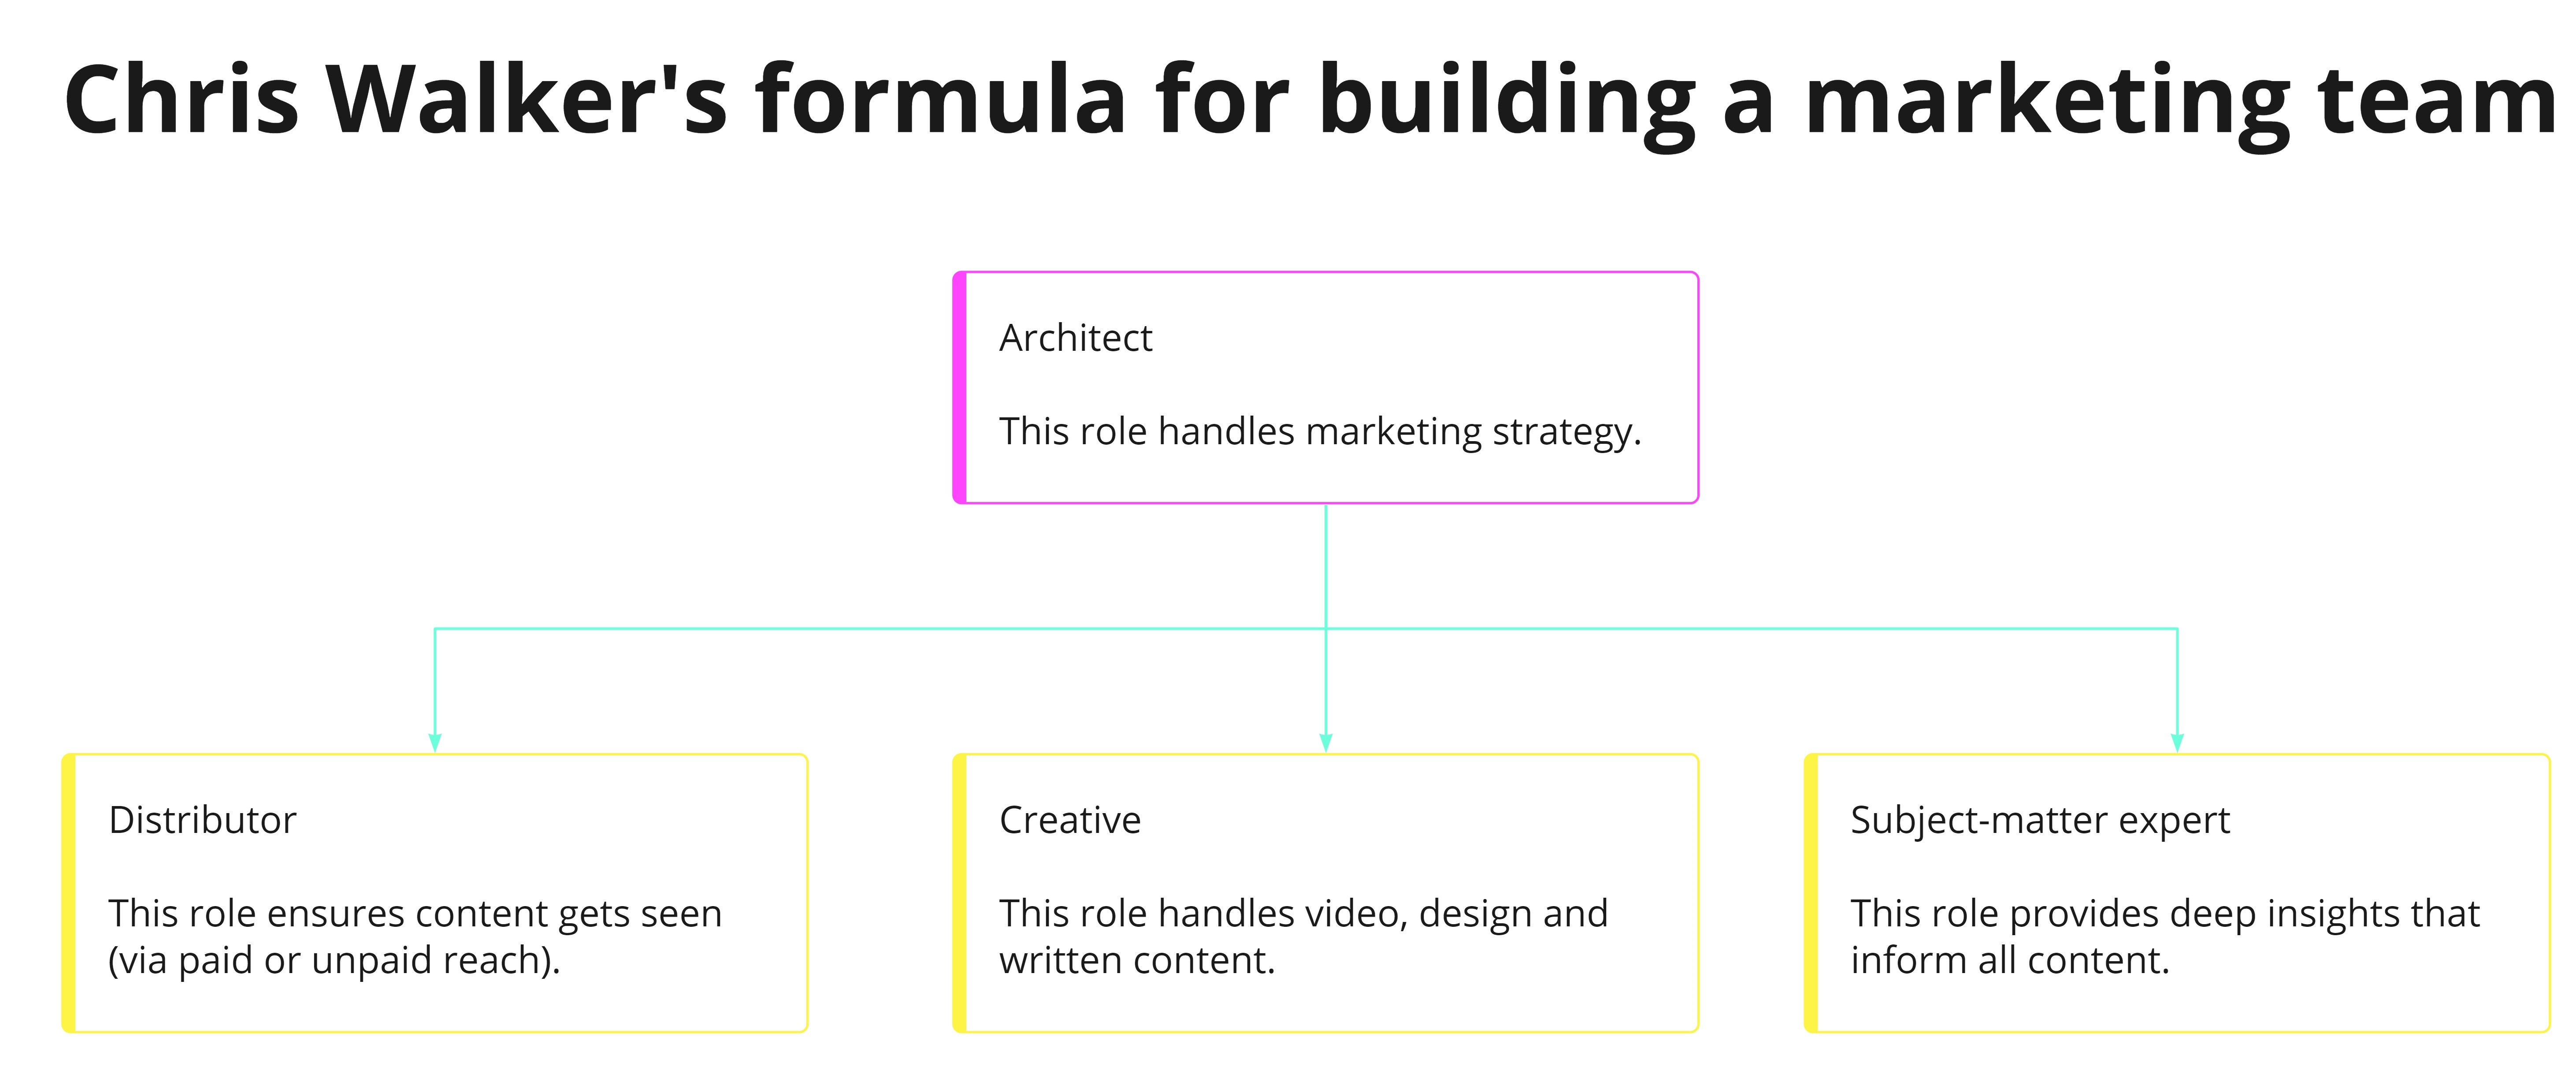 Chris Walker's formula for building a marketing team